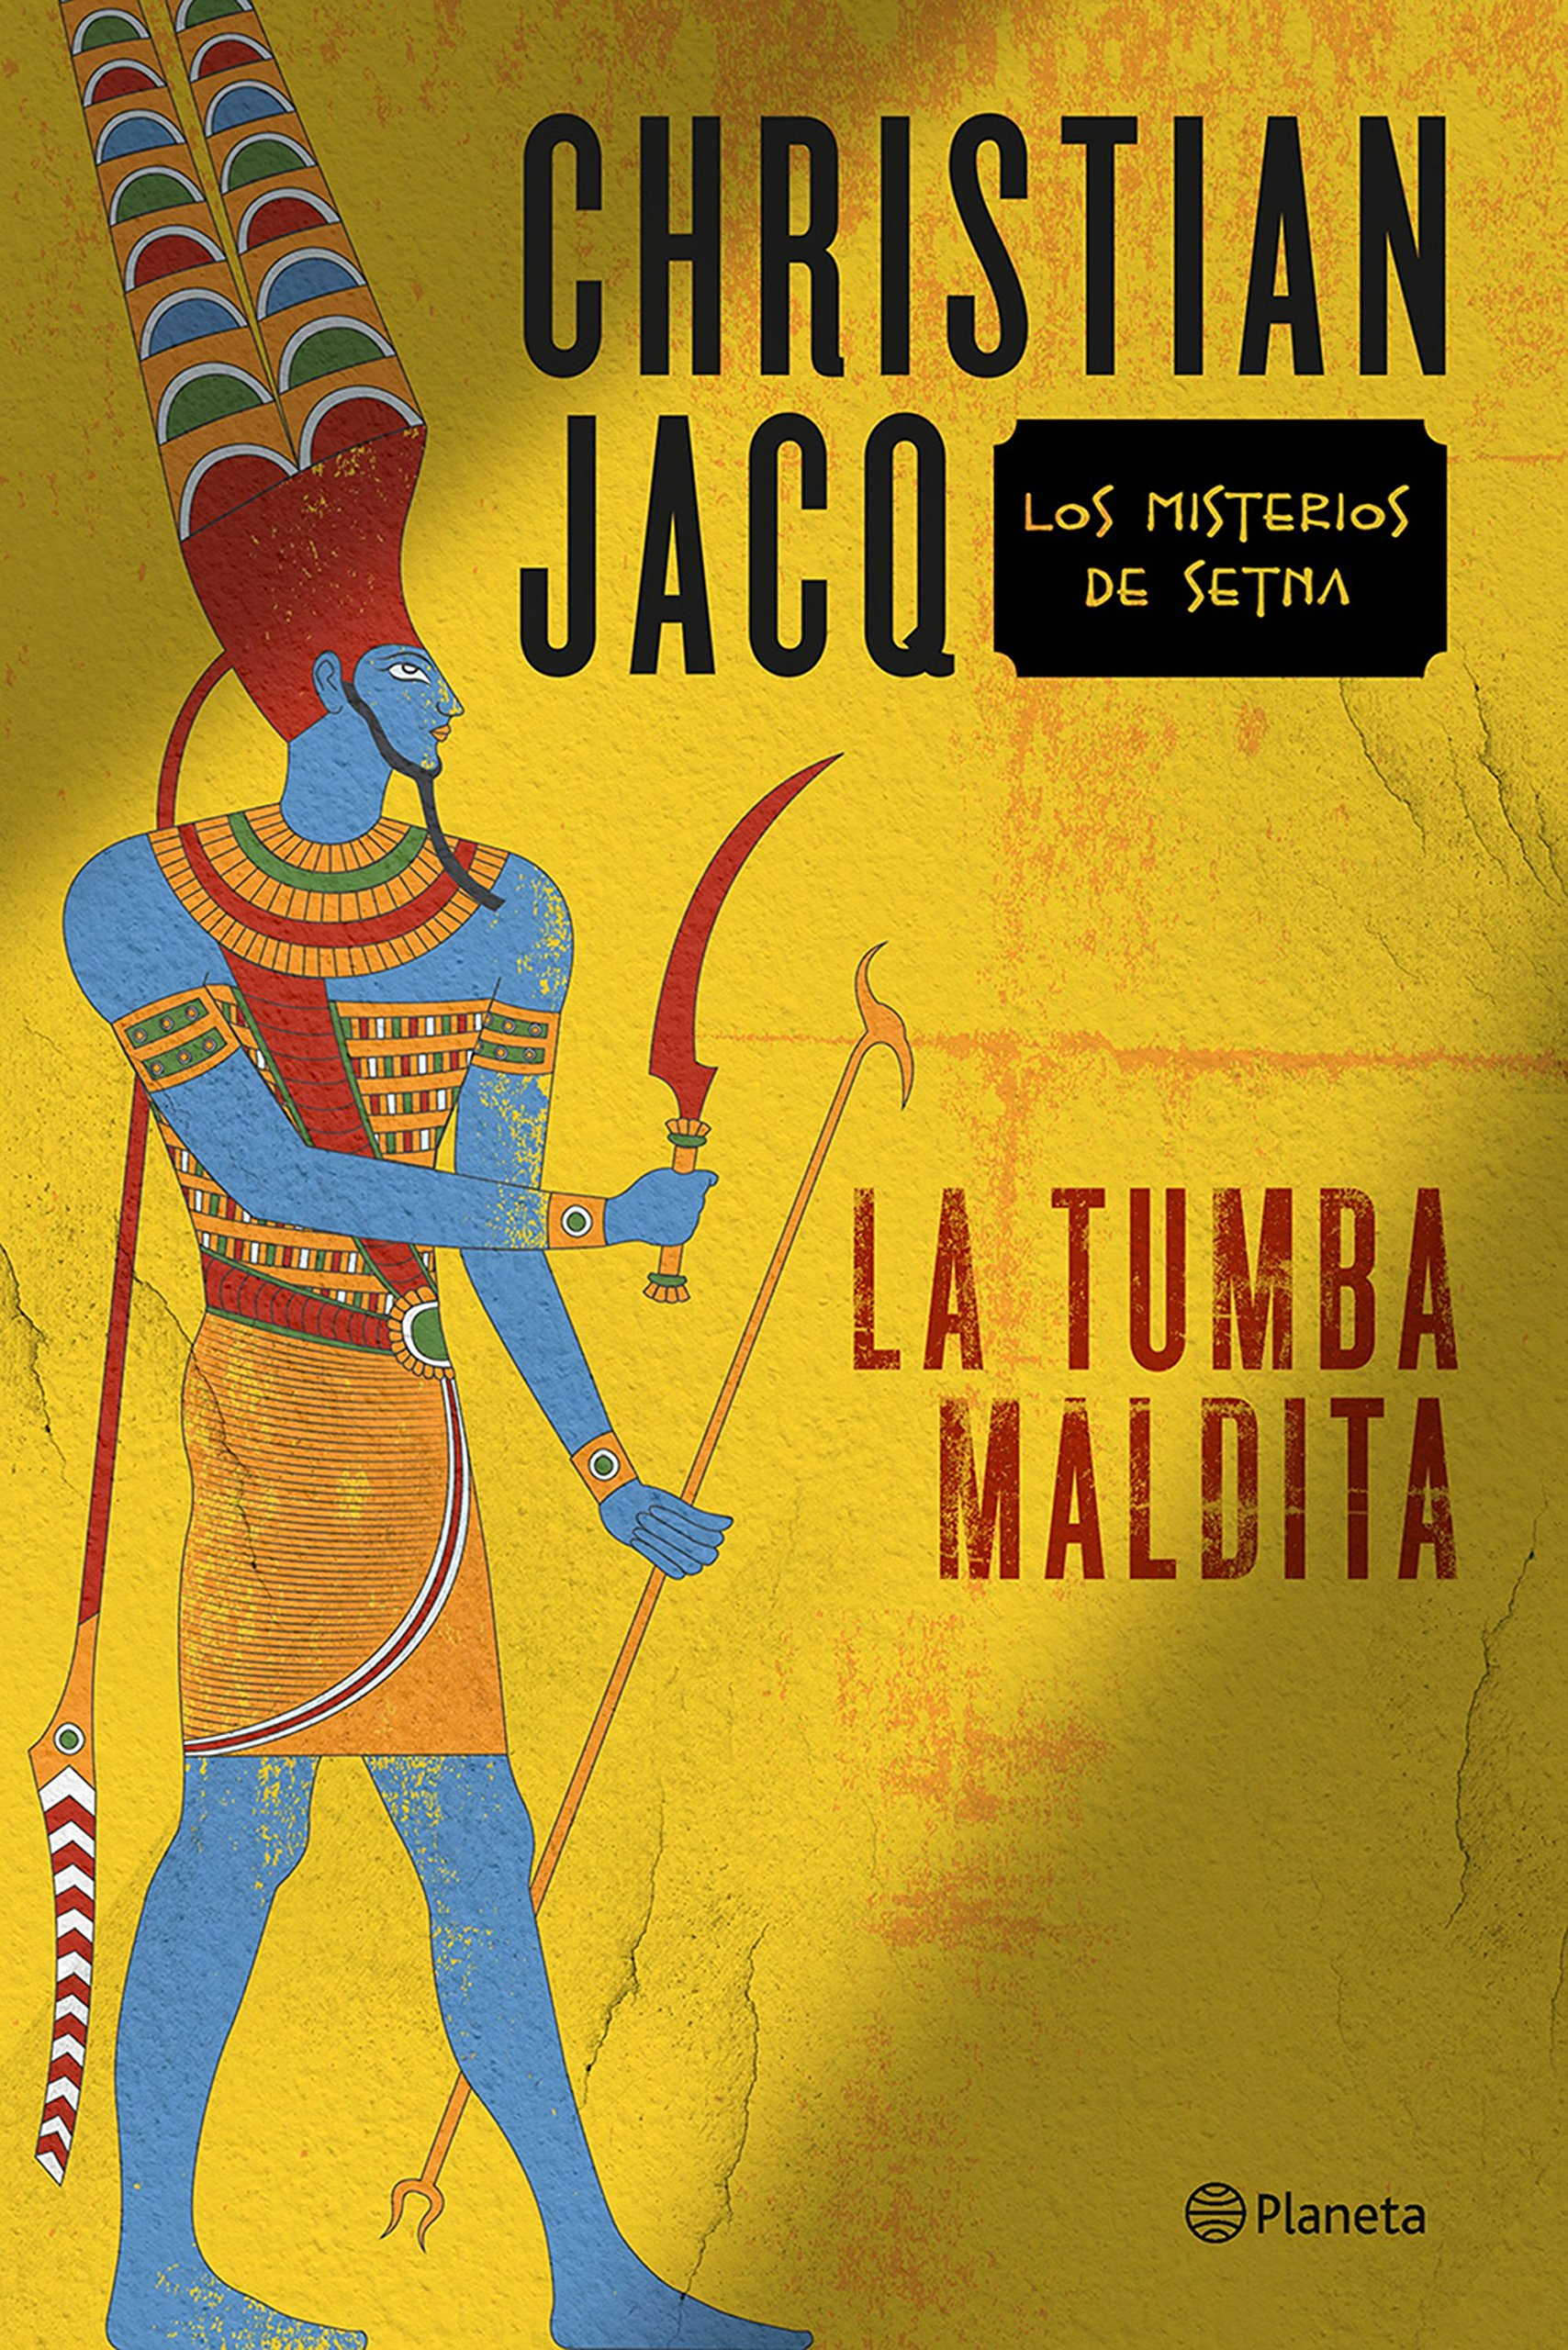 La tumba maldita (Planeta Internacional): Amazon.es: Jacq, Christian, Camargo, Juan: Libros